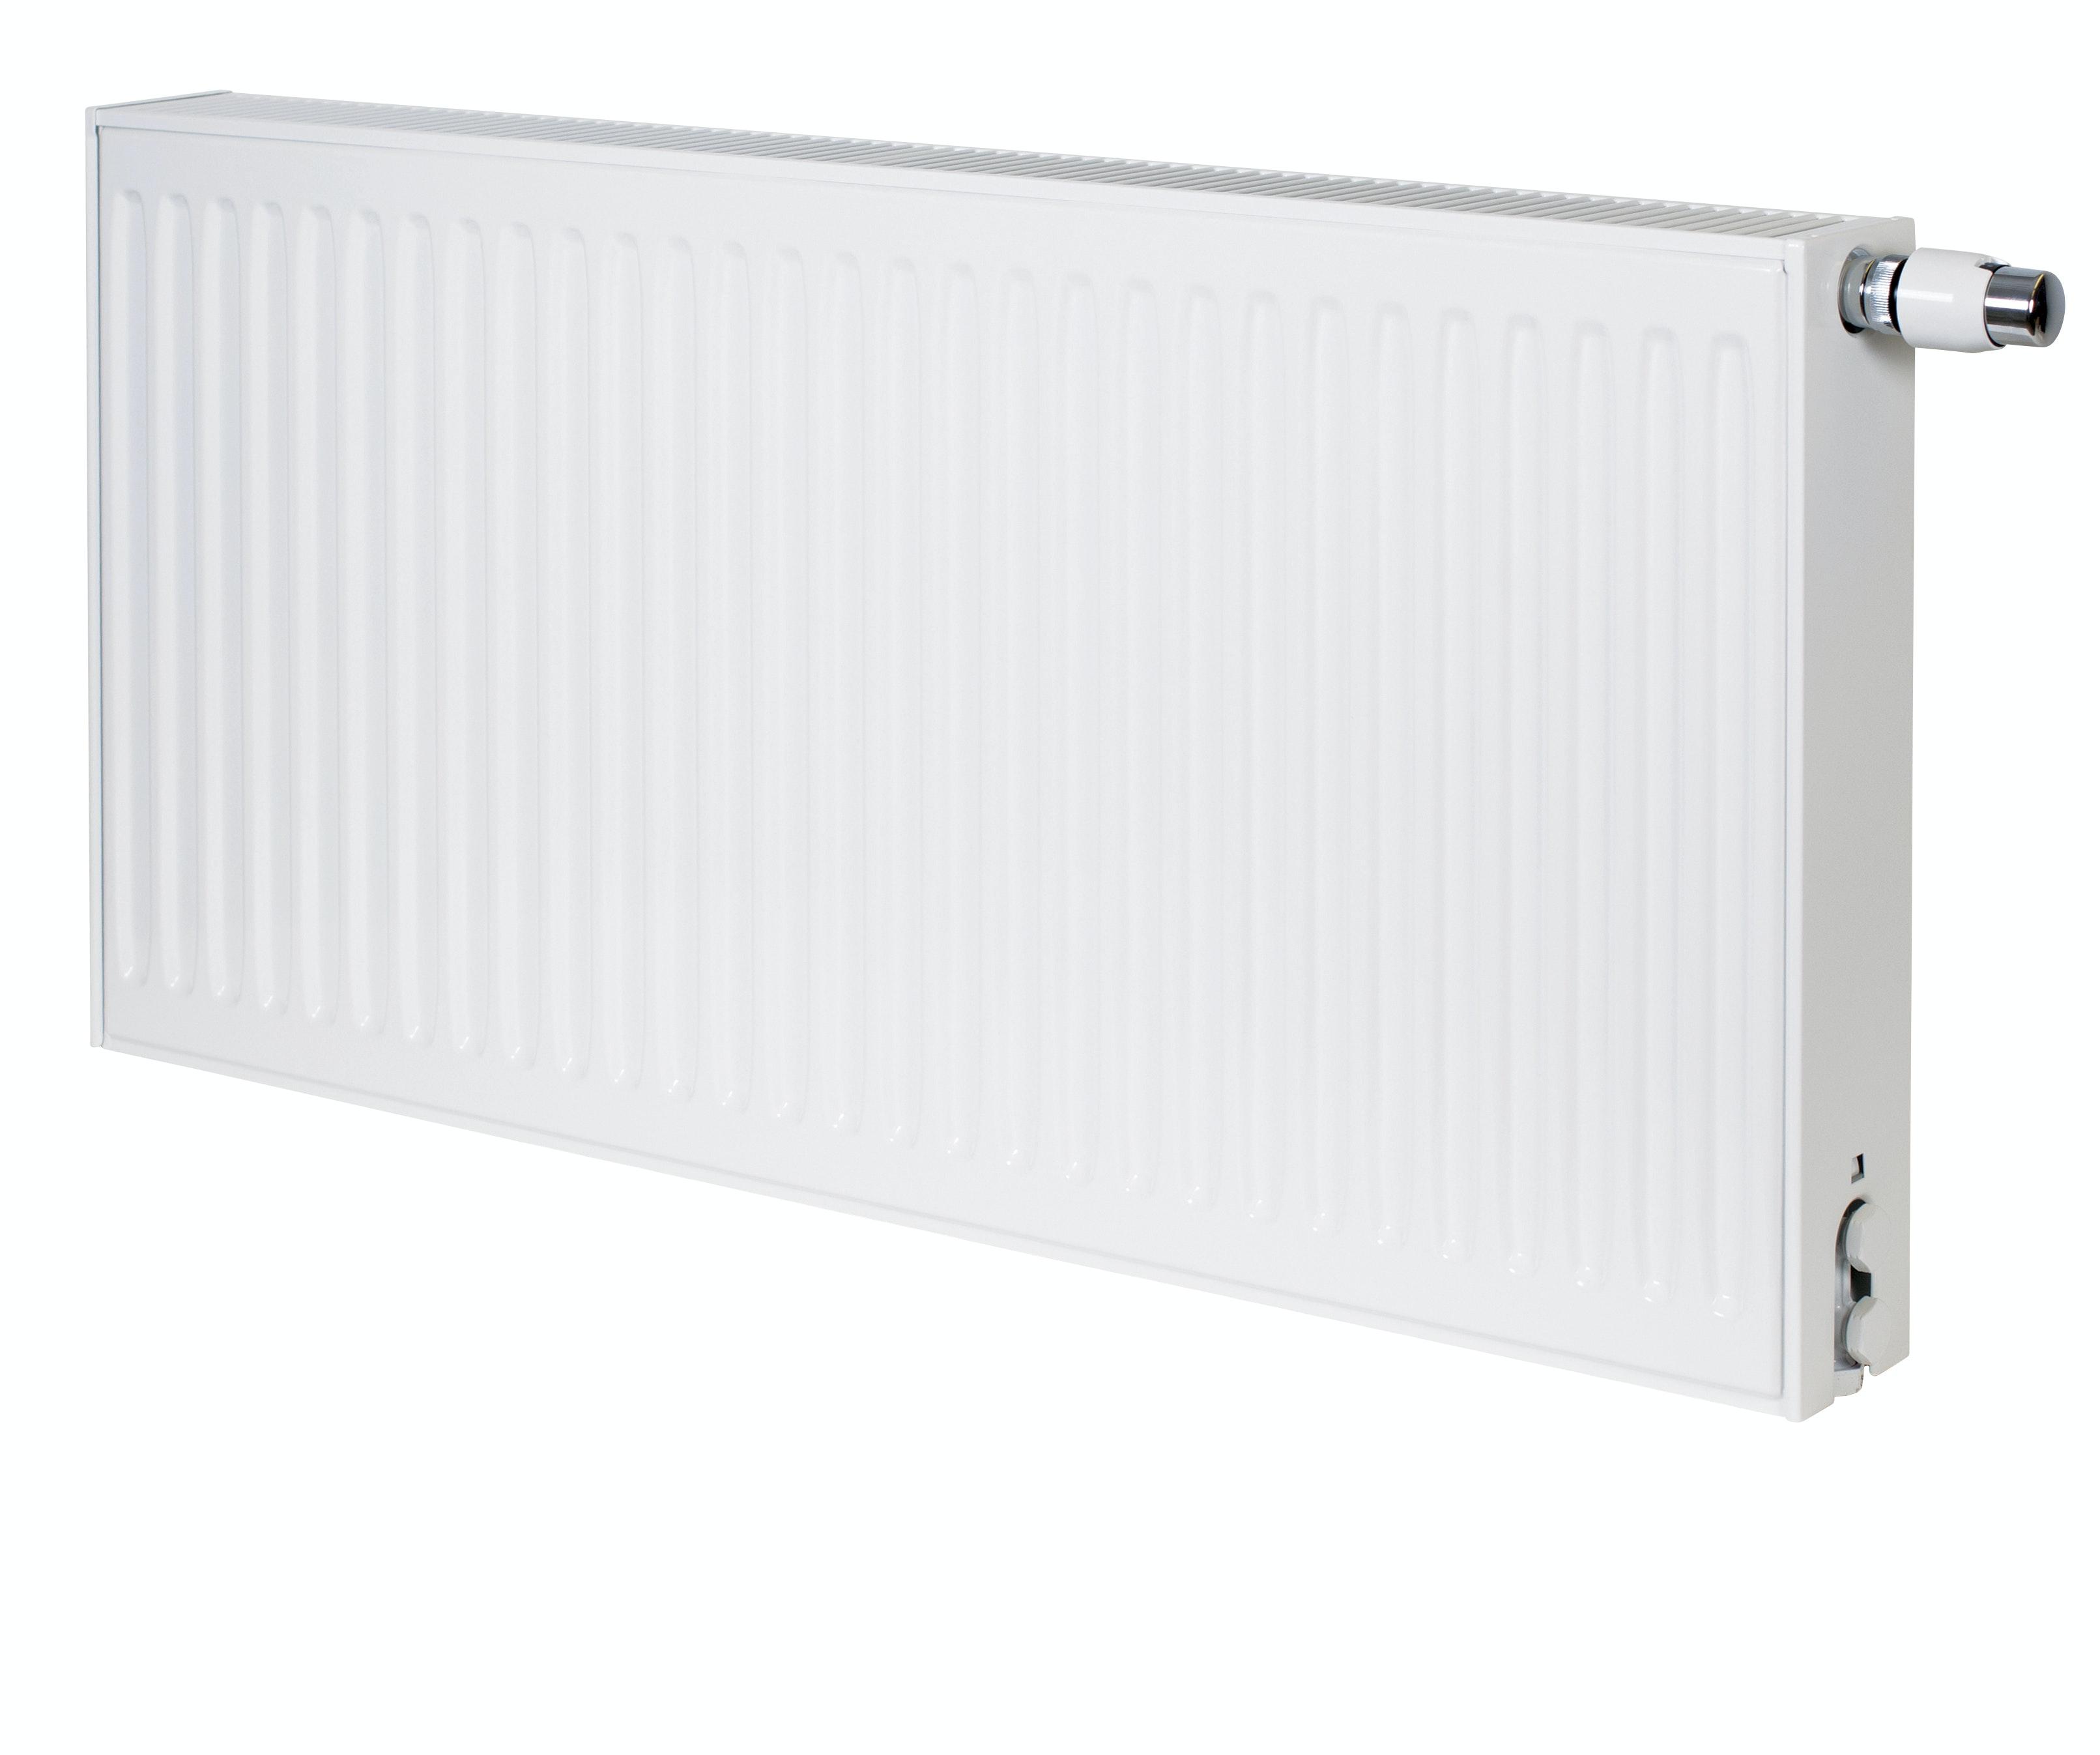 Element Thermopanel V4 TP22 509 500x900mm